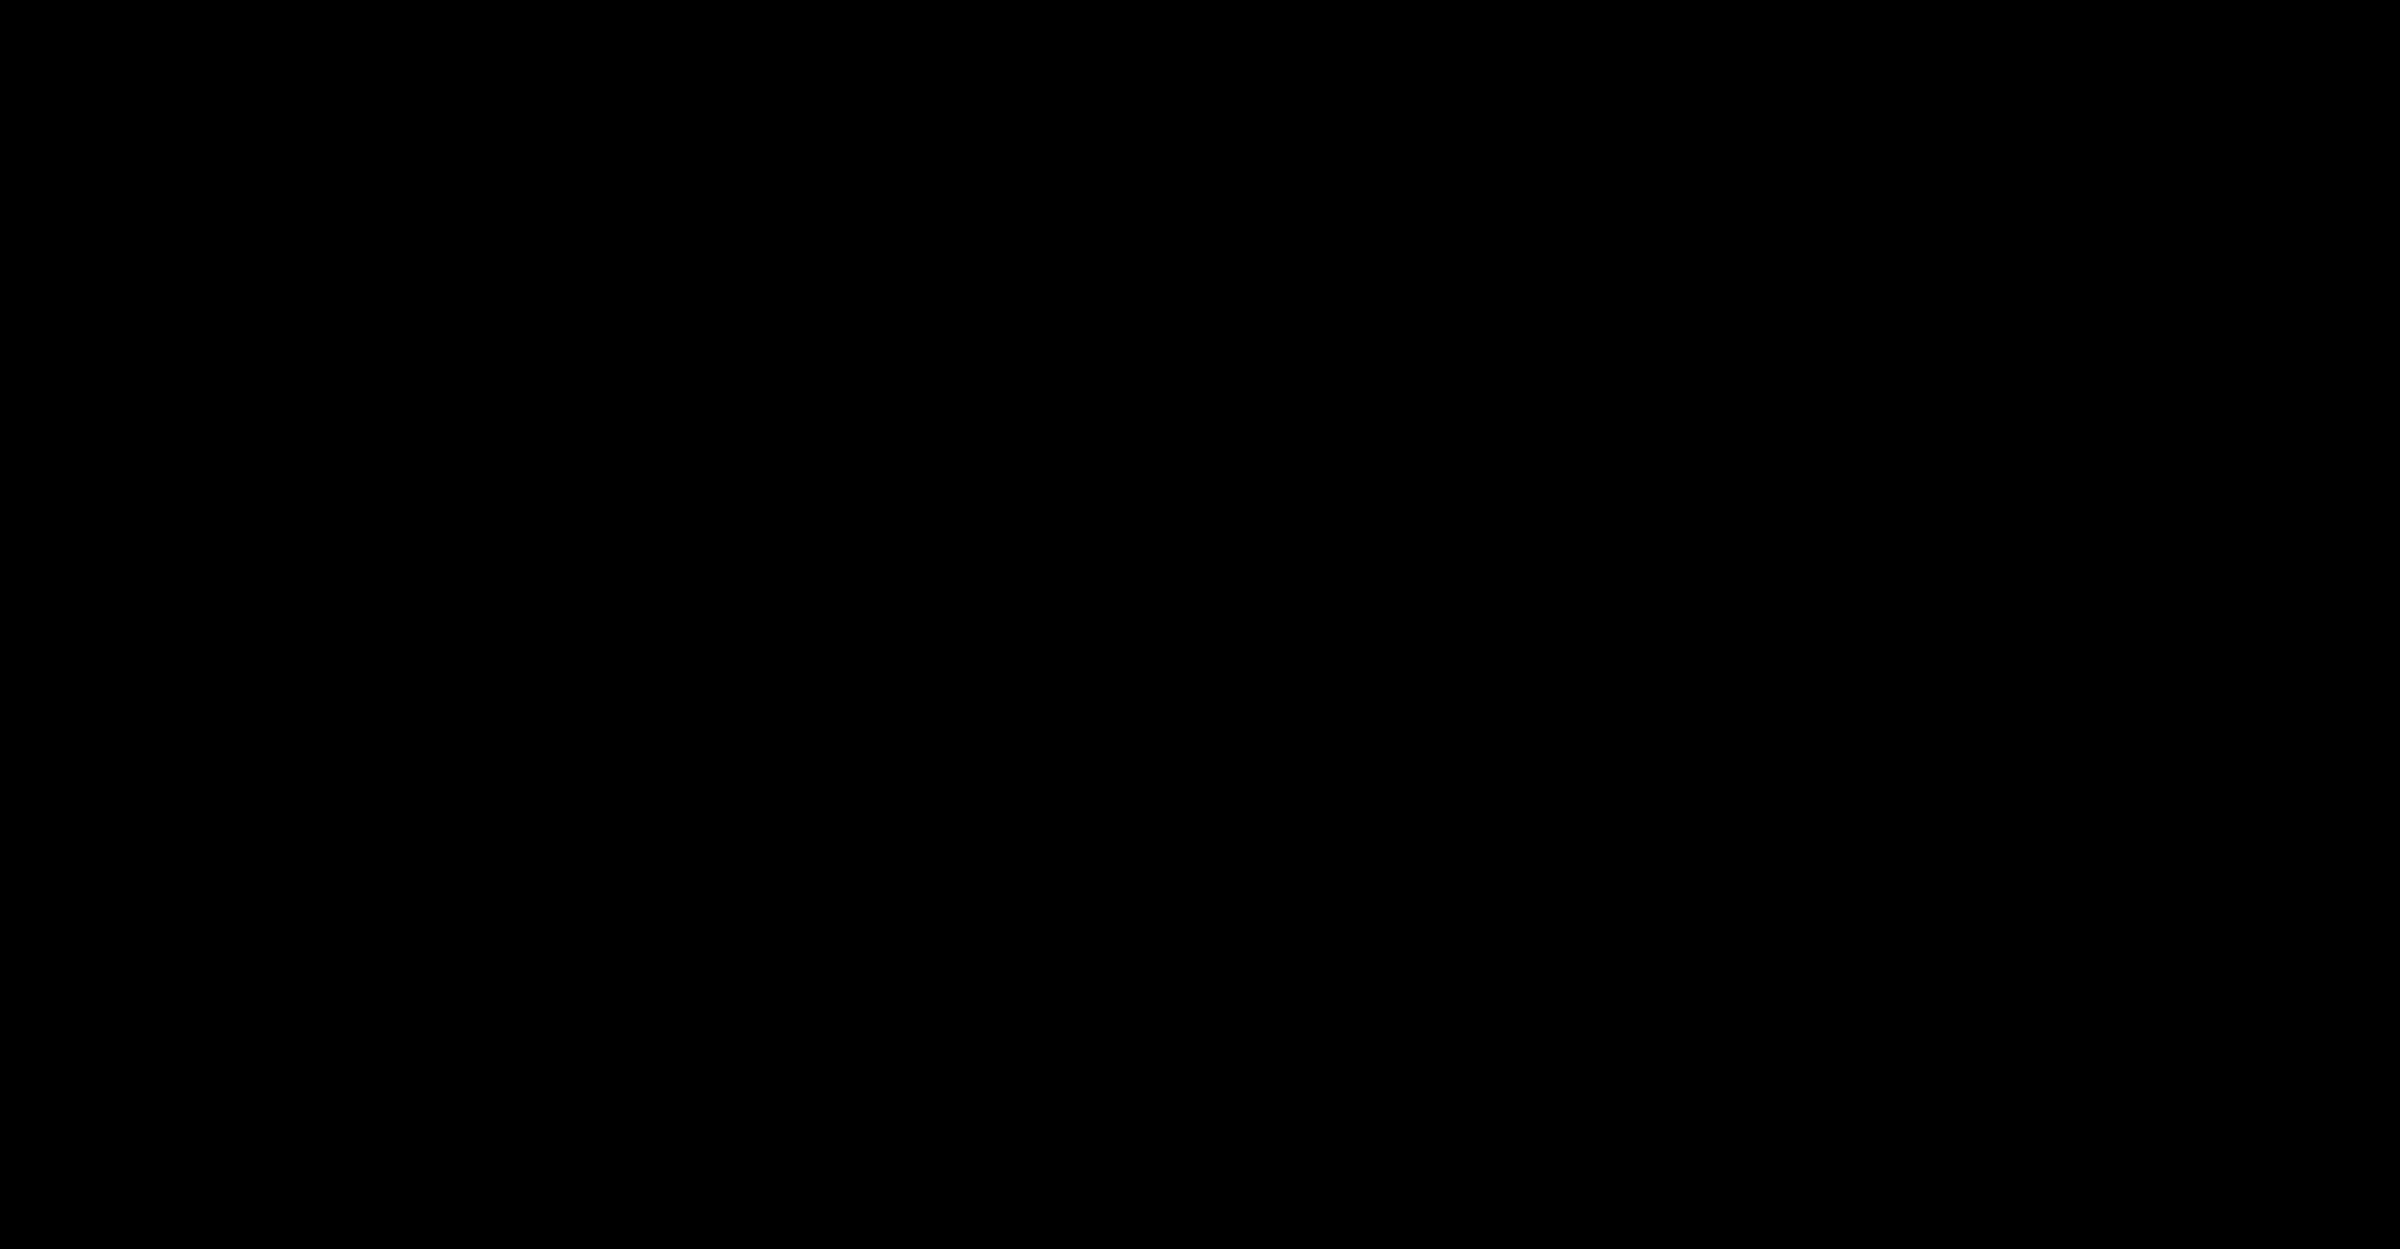 Shaow clipart pig Silhouette Clipart Pig silhouette Pig